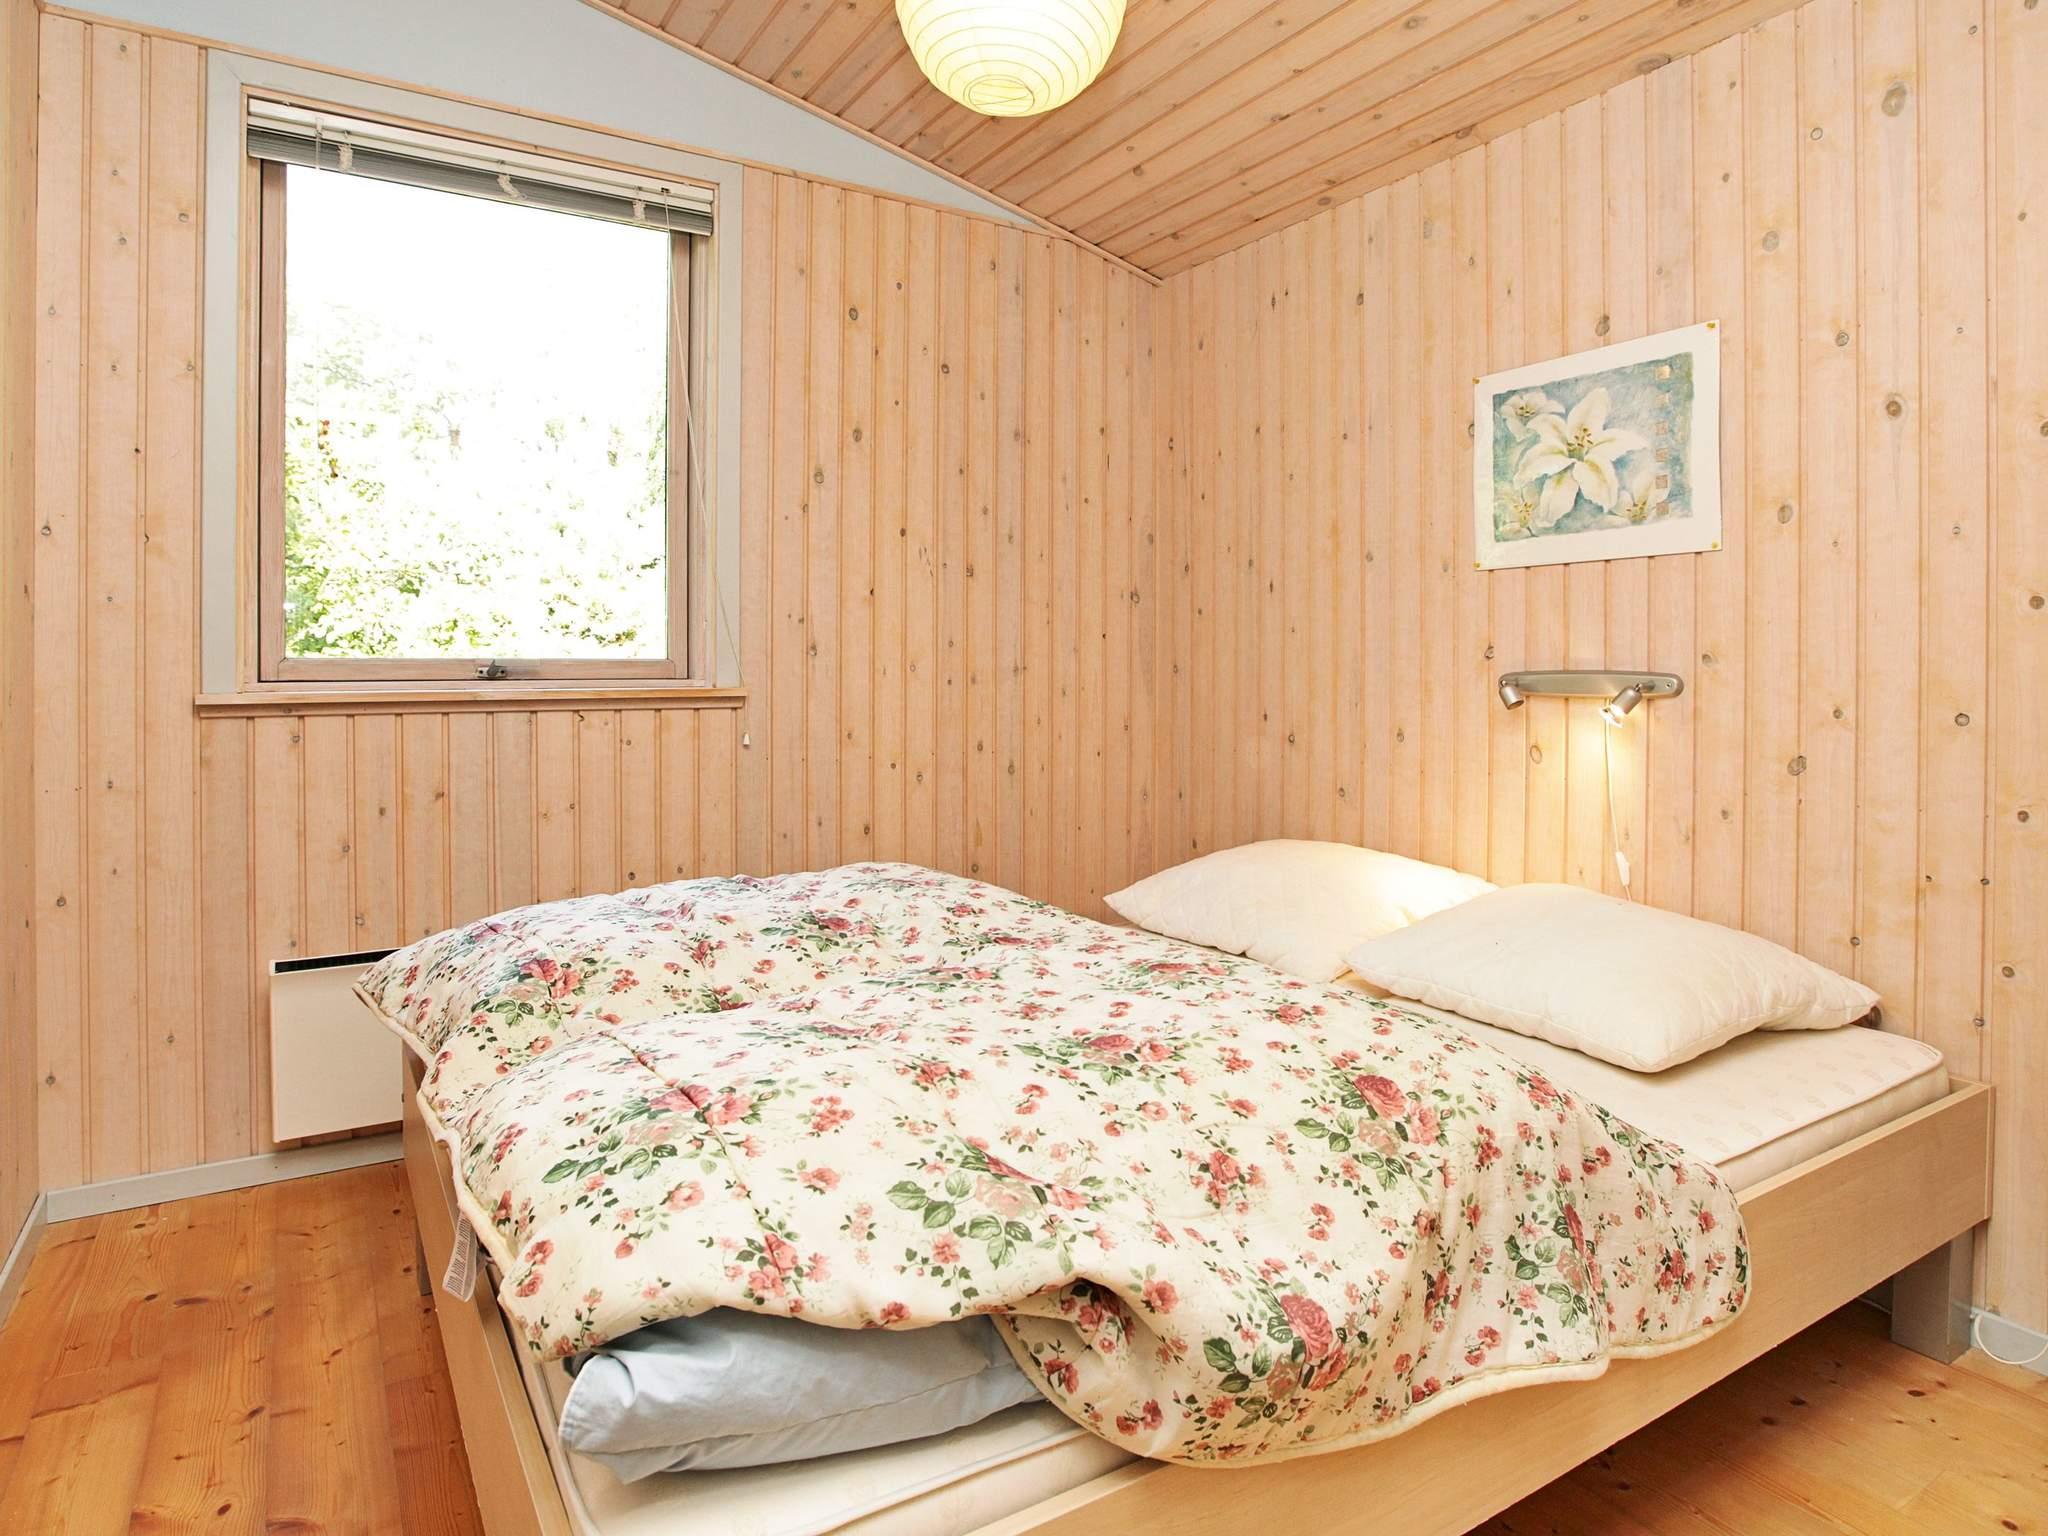 Ferienhaus Overby Lyng (93505), Nykøbing Sj, , Westseeland, Dänemark, Bild 17